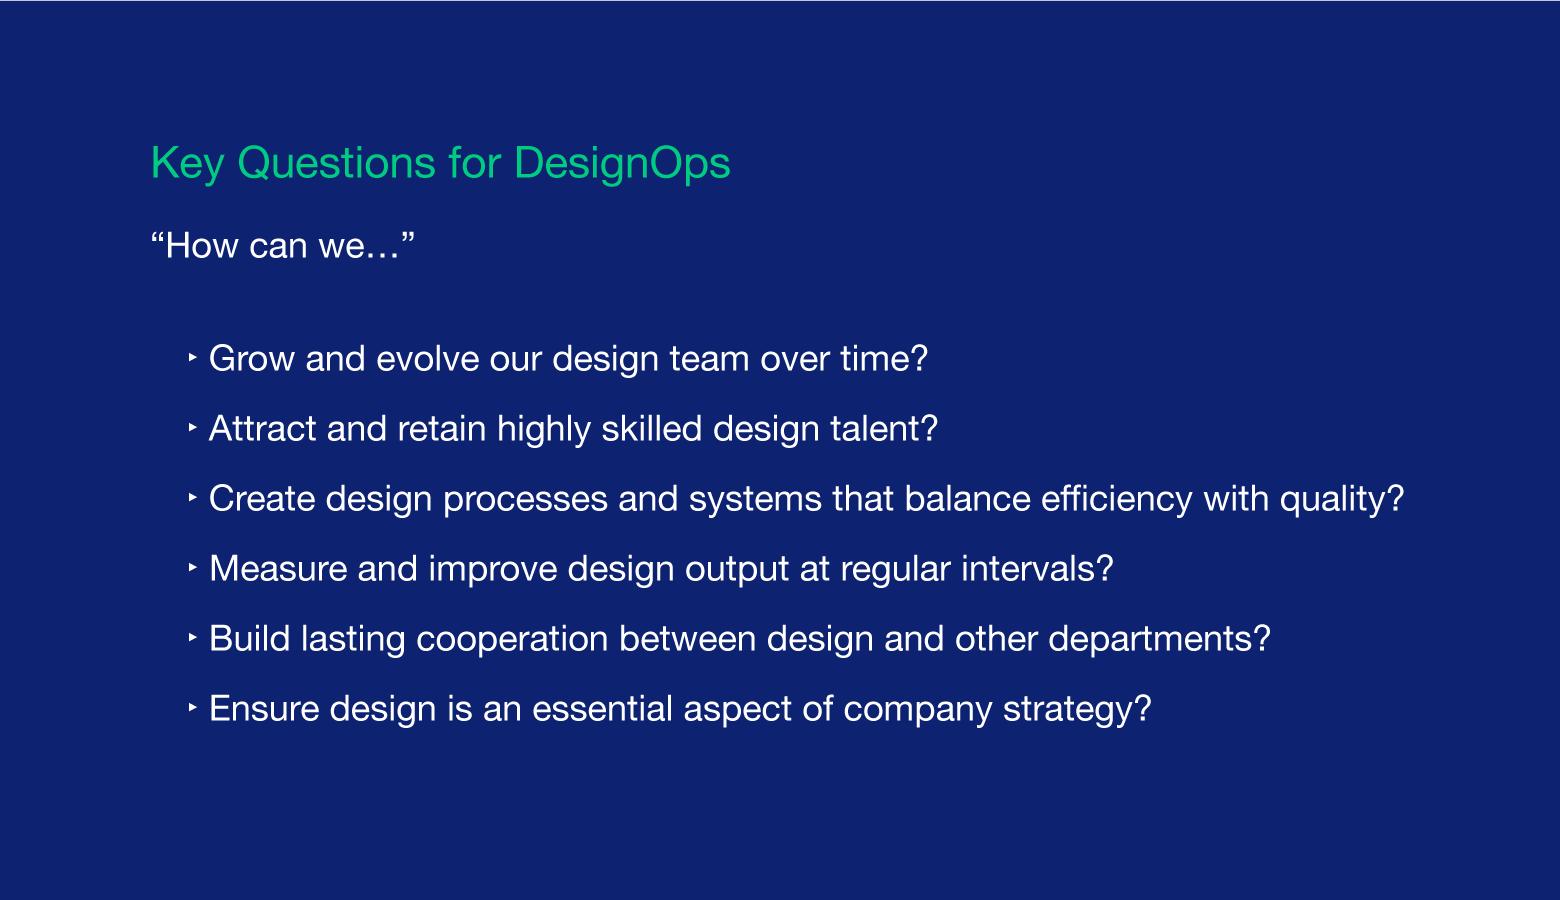 DesignOps addresses big-picture business questions.